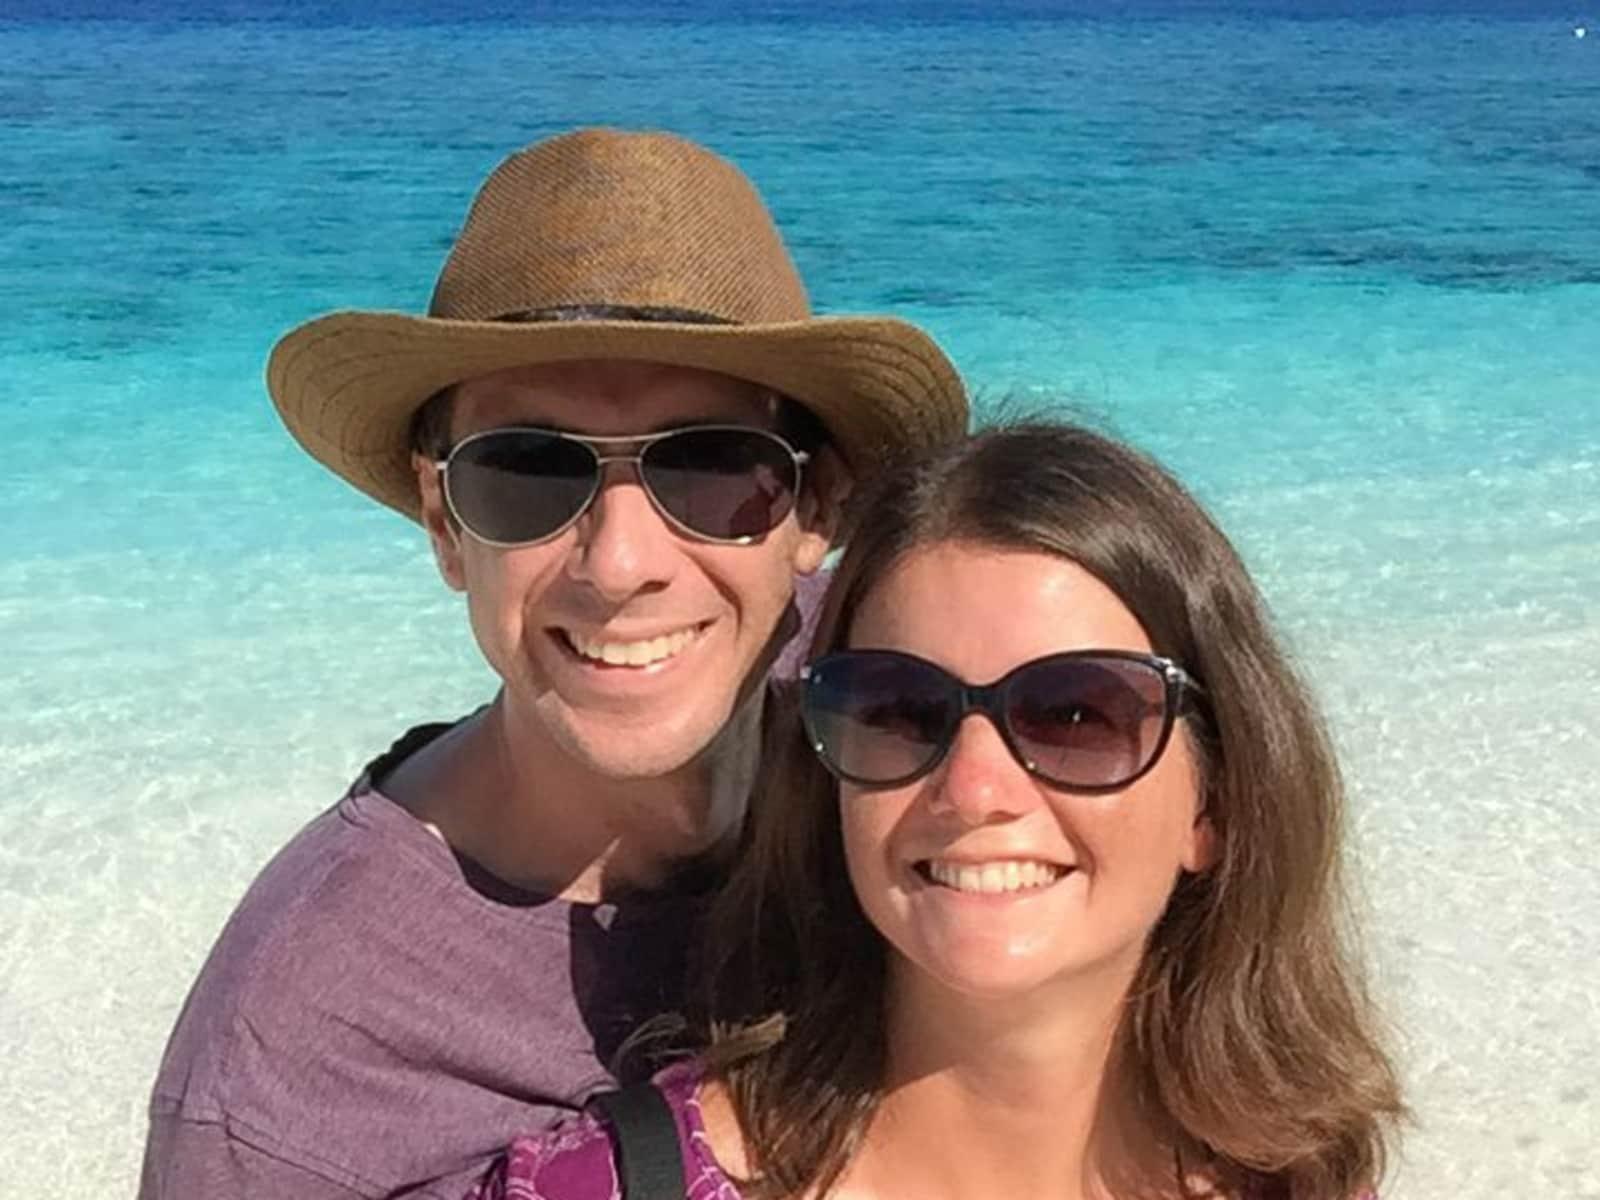 Erin & Simon from Burnley, United Kingdom